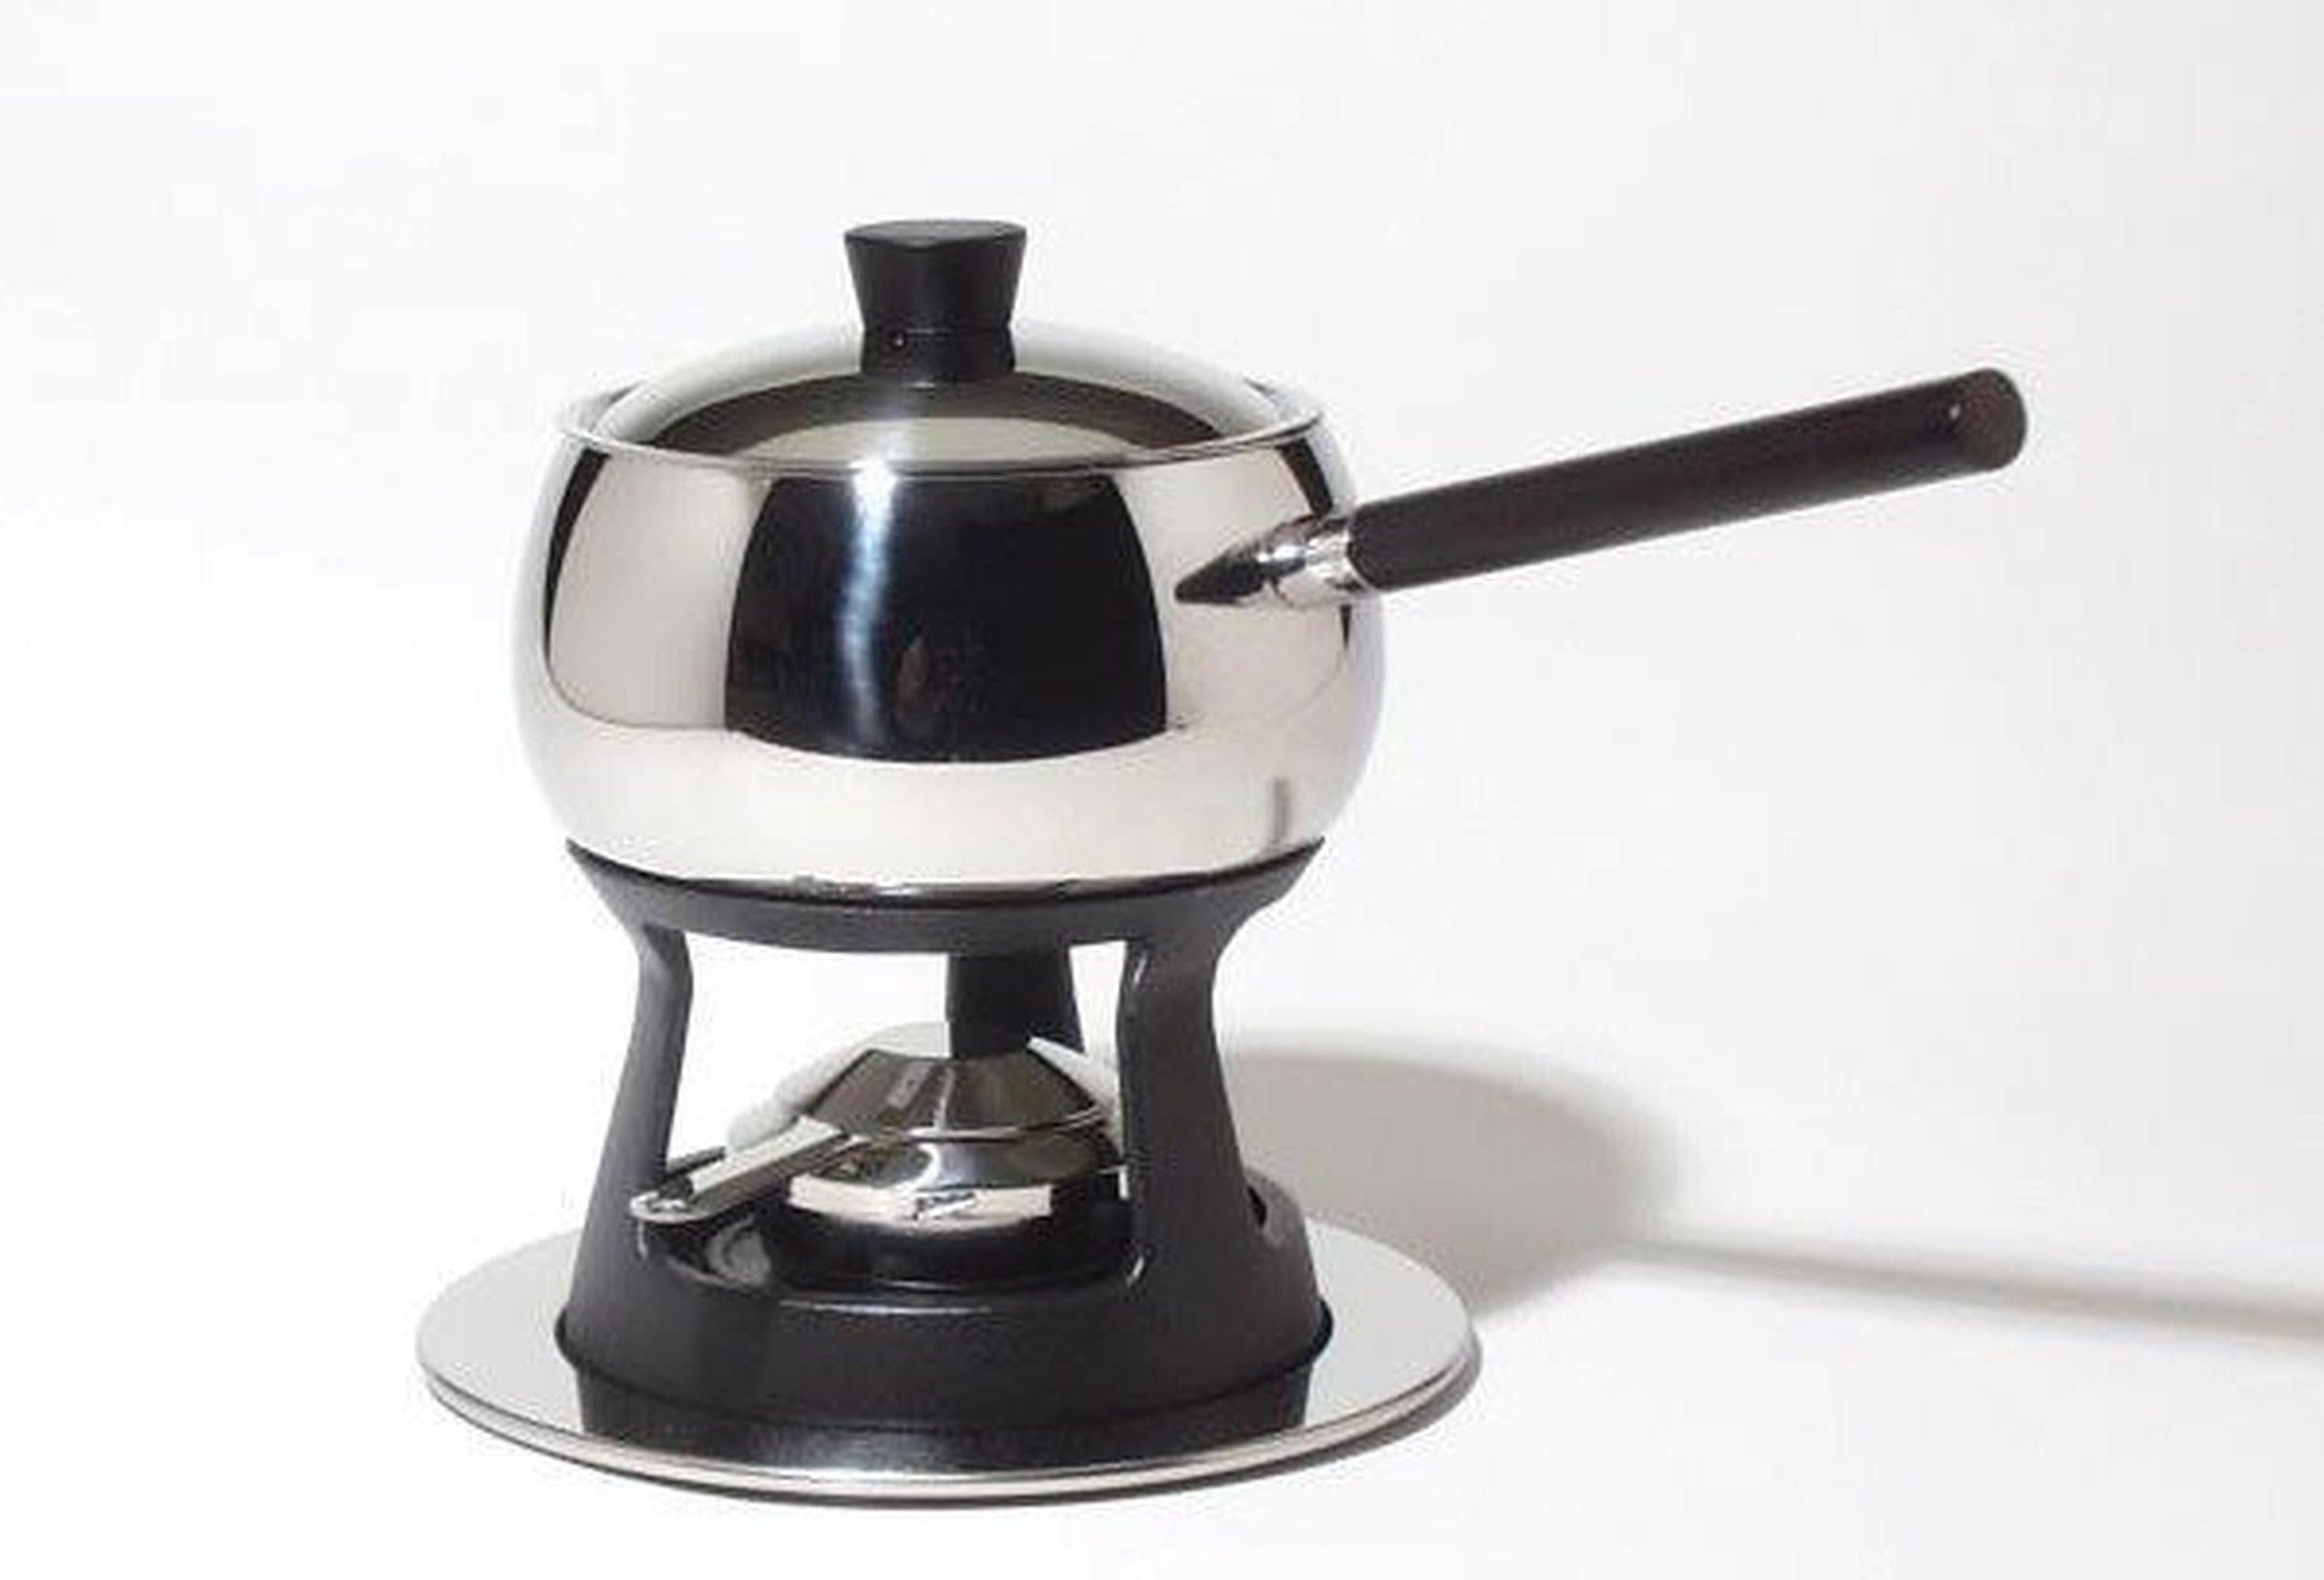 mami fondue bourguignonne pot alessi. Black Bedroom Furniture Sets. Home Design Ideas